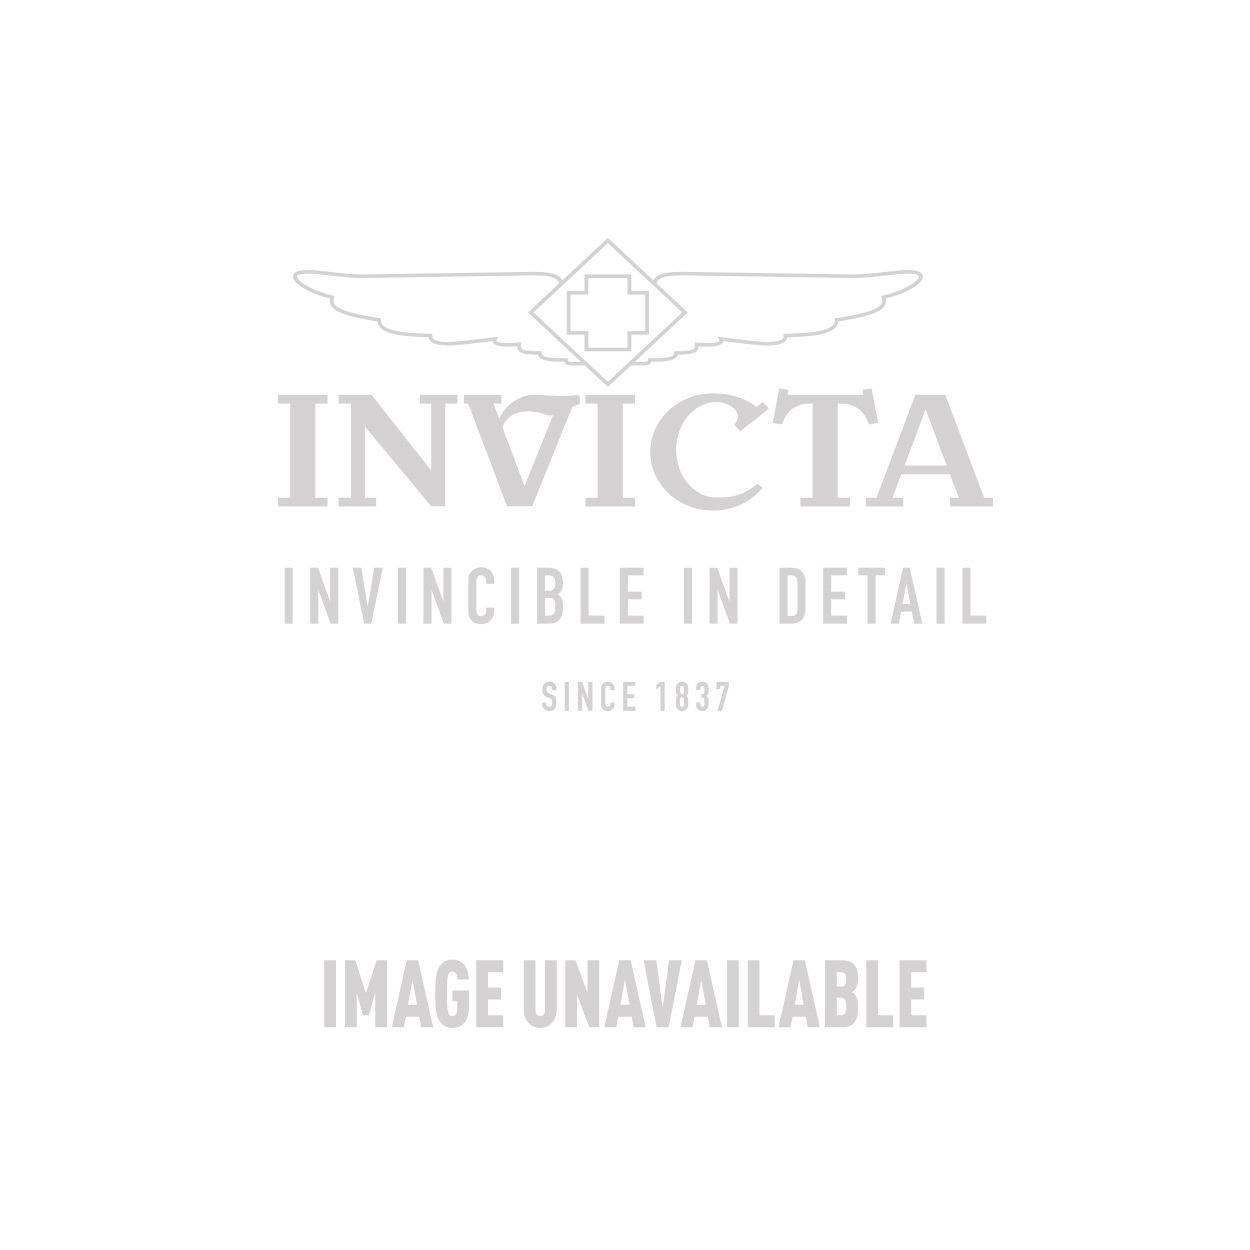 Invicta Speedway Quartz Watch - Stainless Steel case Stainless Steel band - Model 14384